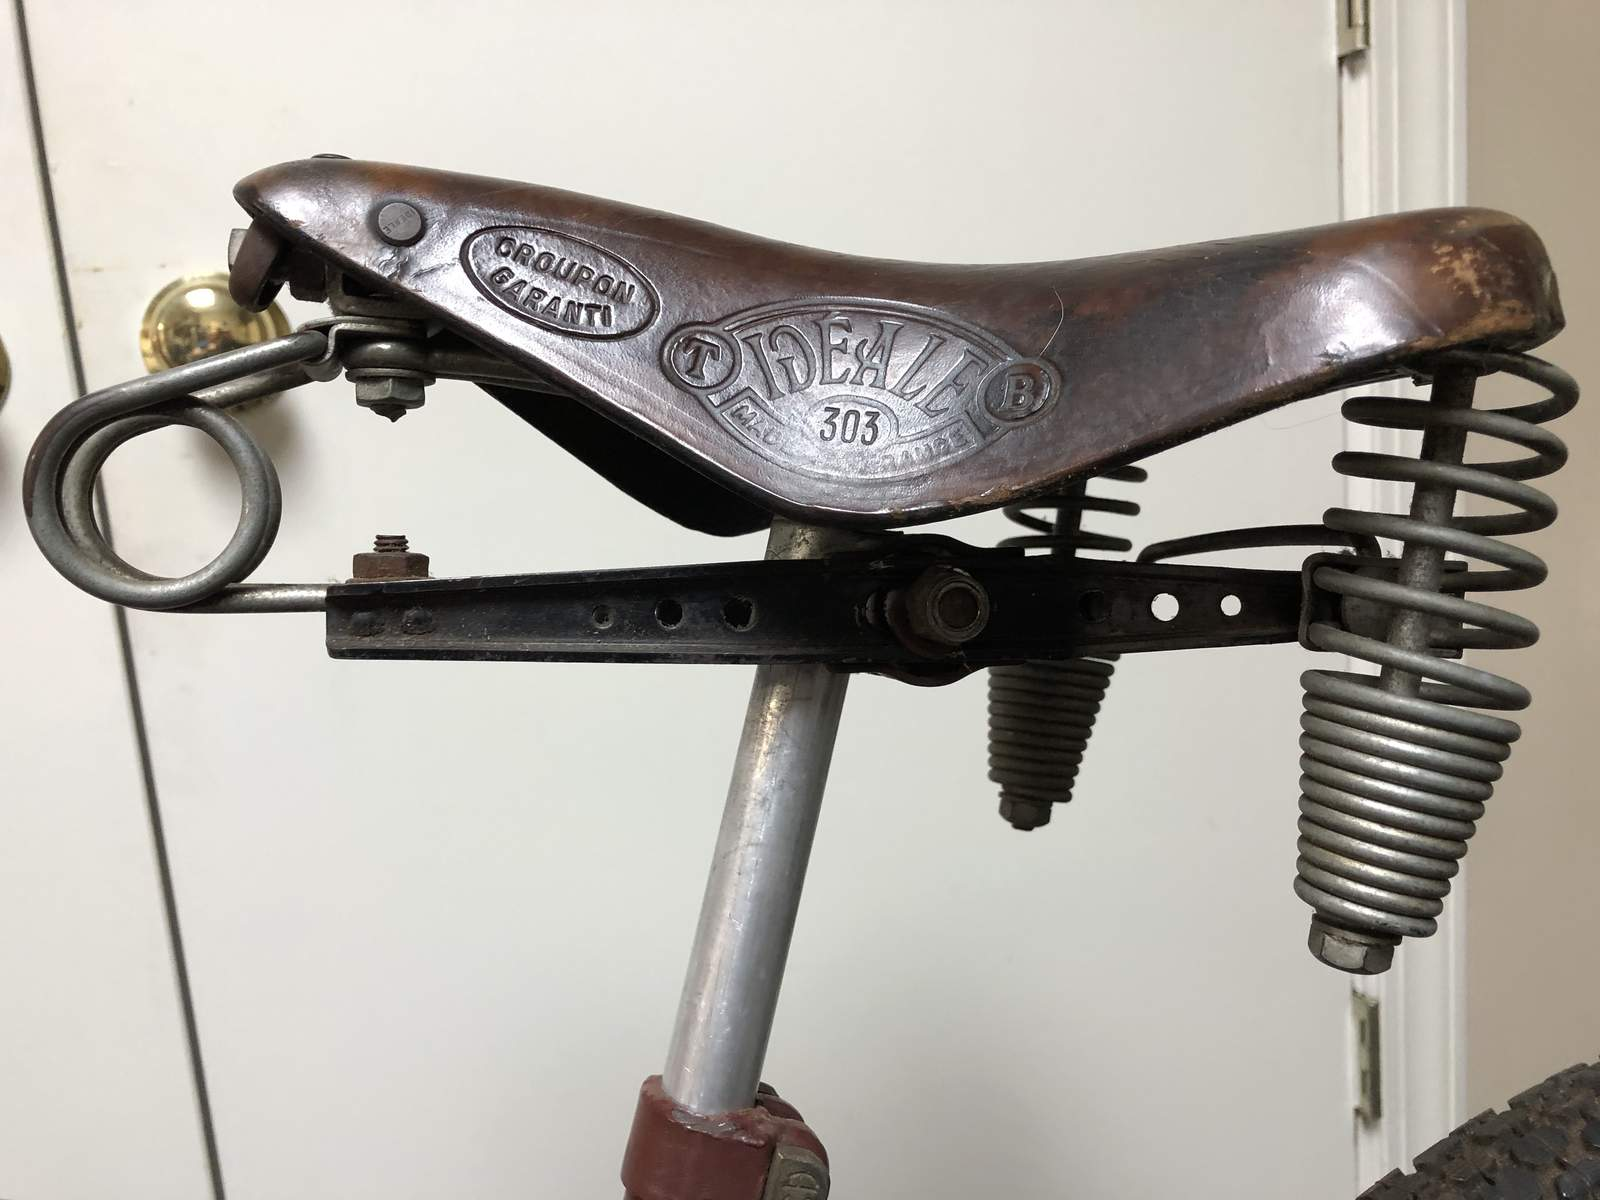 http://uploads.bmxmuseum.com/user-images/48413/saddle5de7db1d50.jpg